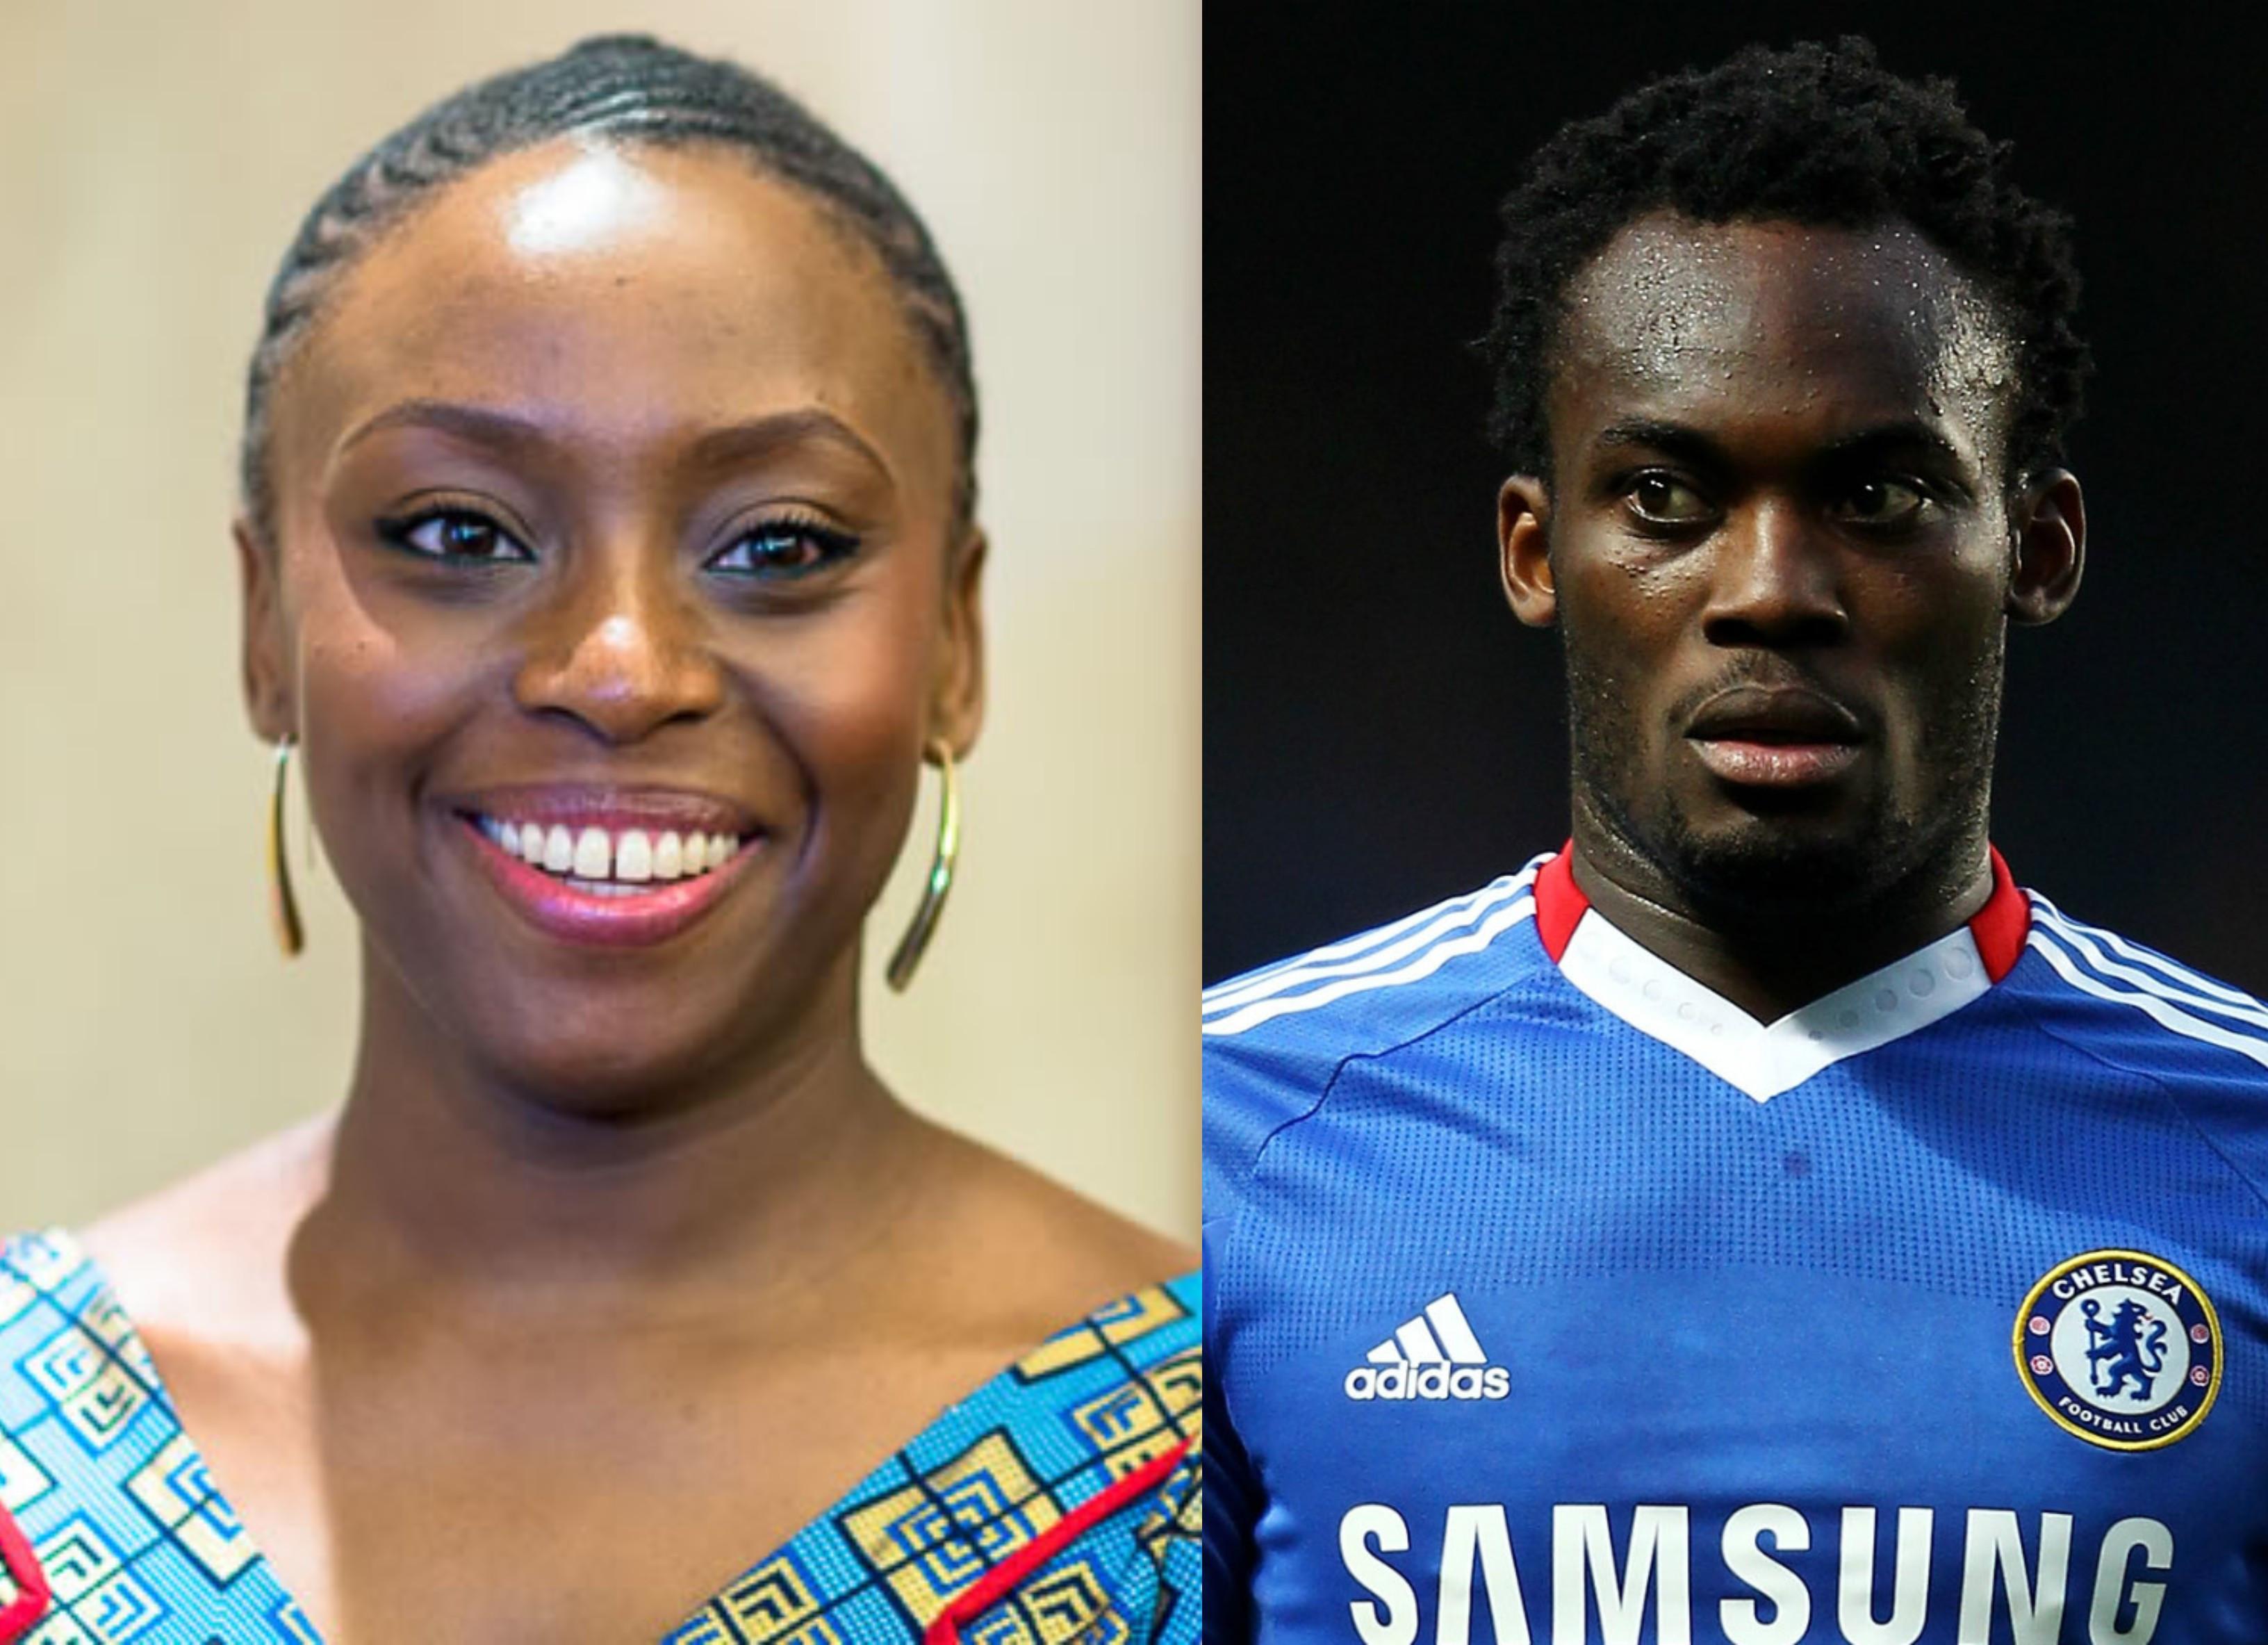 I once had a crush on Michael Essien - Chimamanda Adichie lindaikejisblog